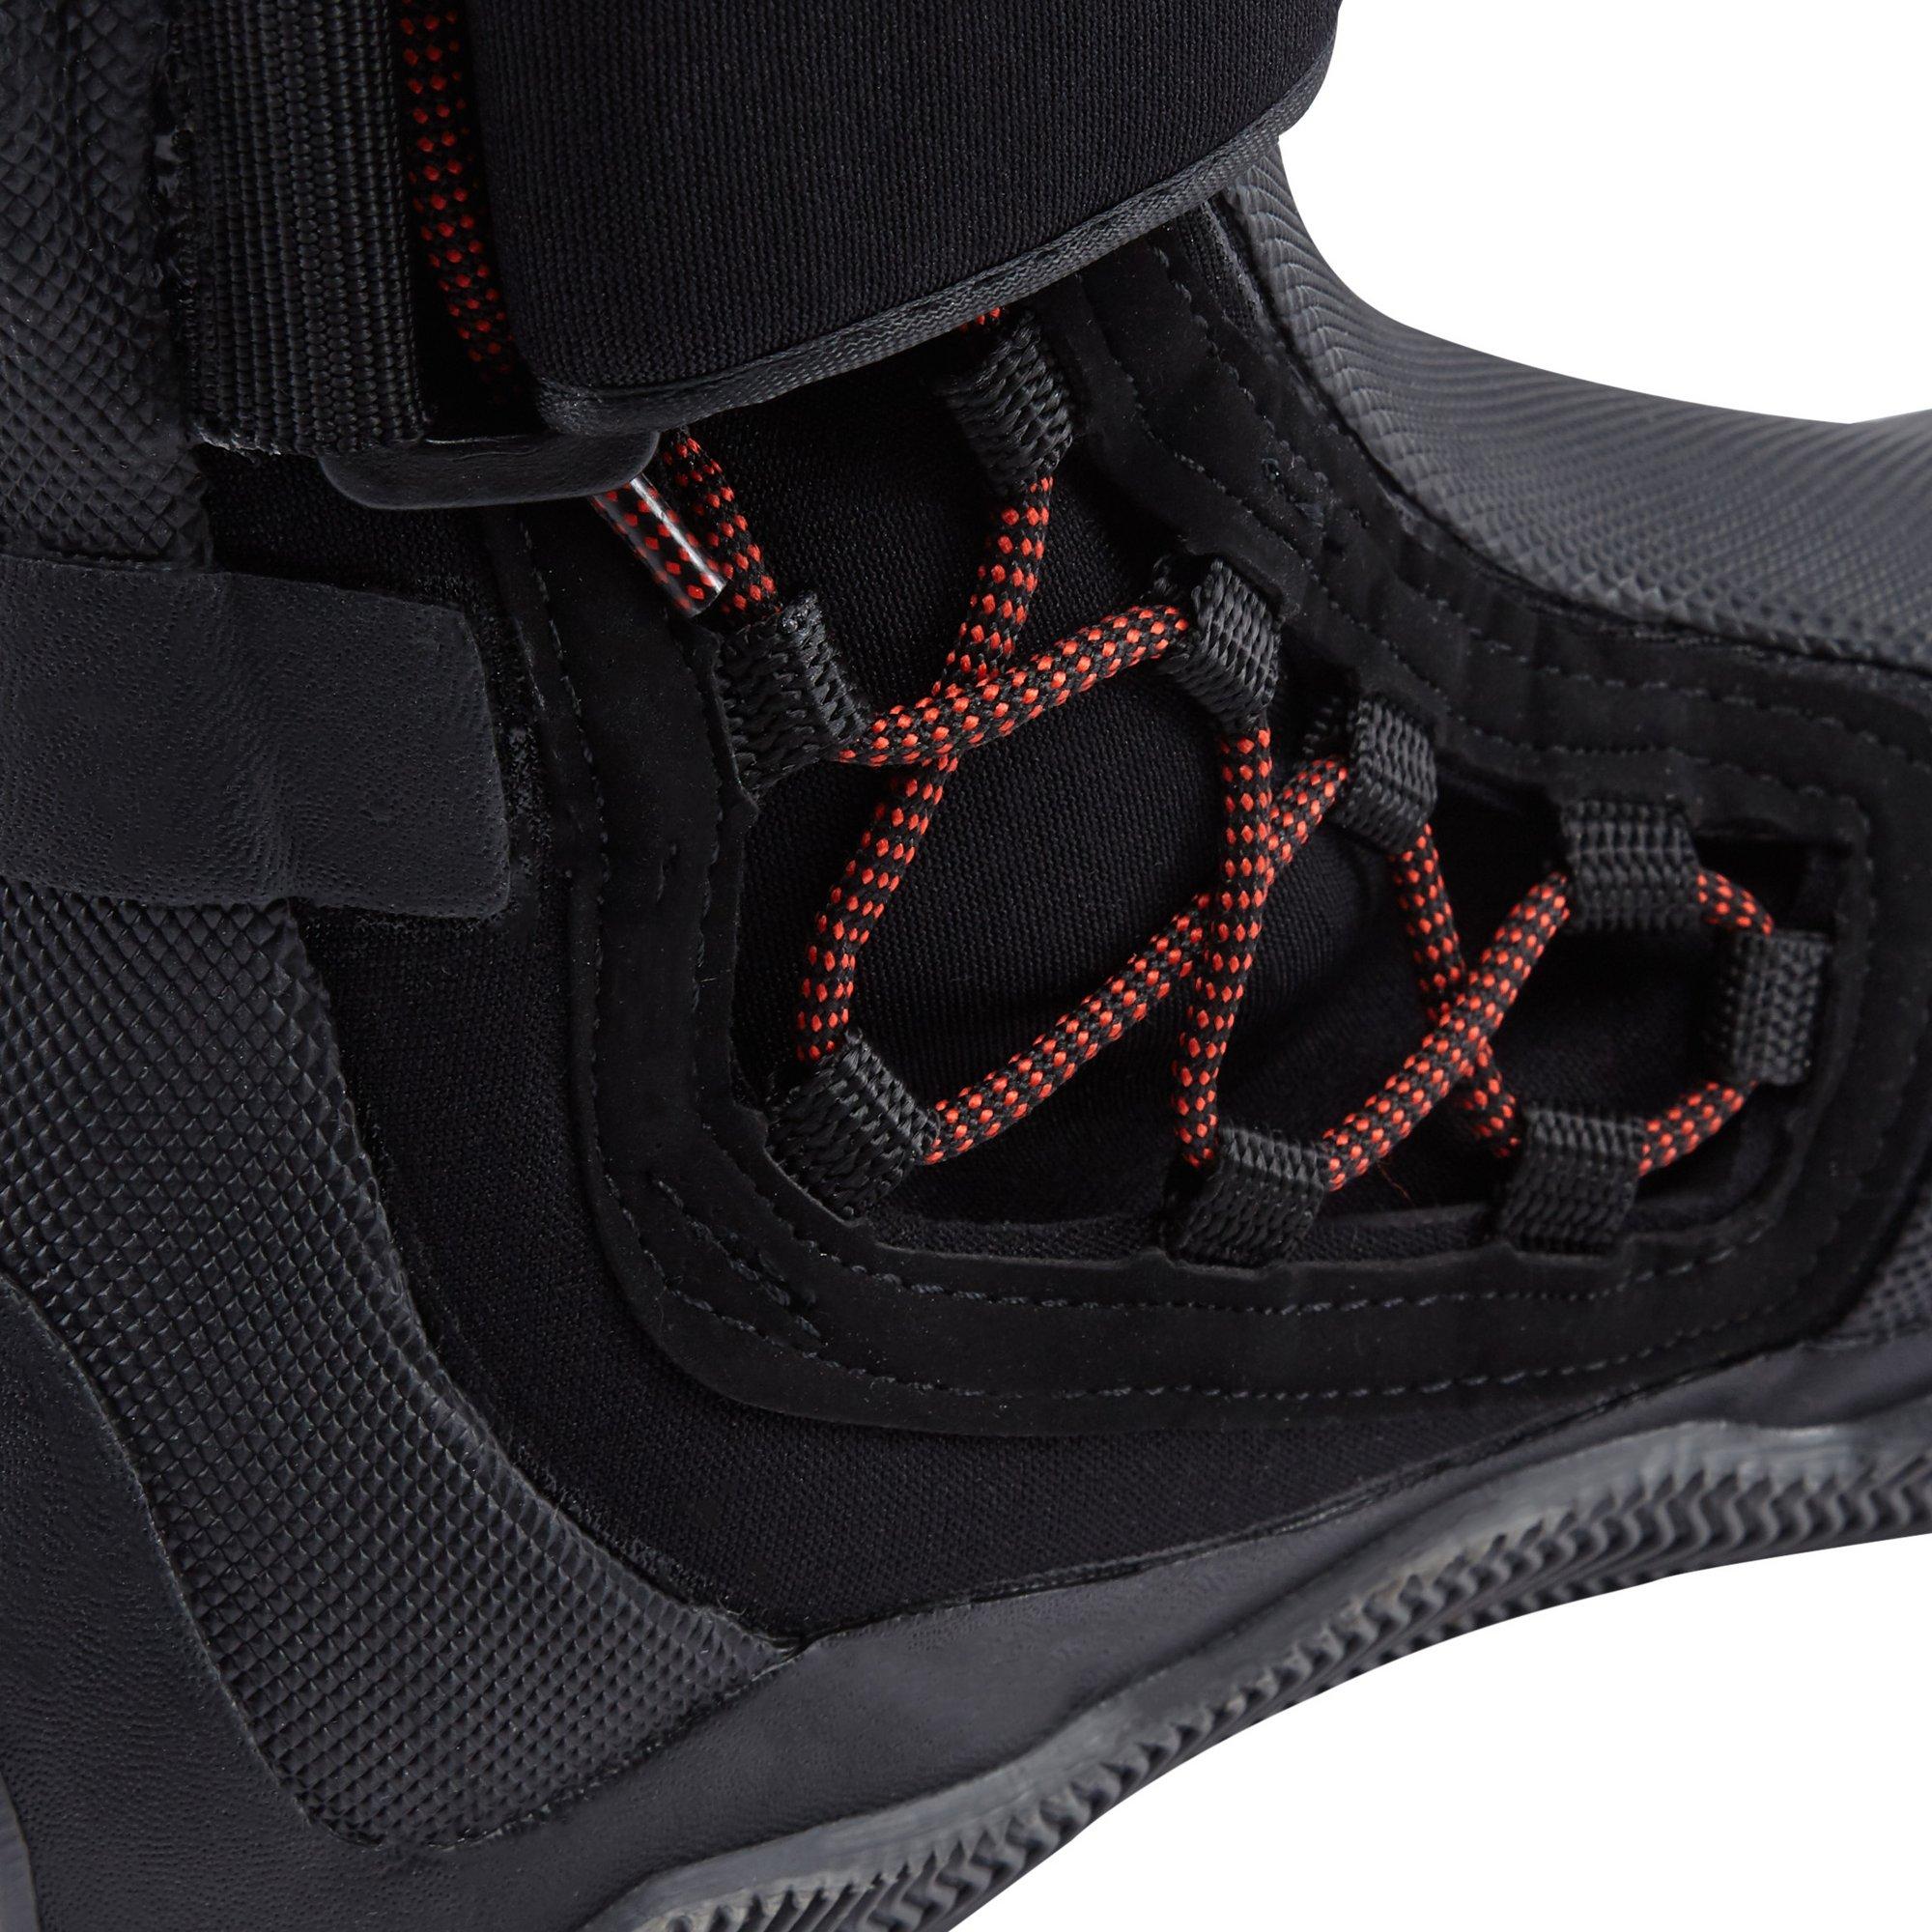 Edge Boots - 961-BLK20-4.jpg